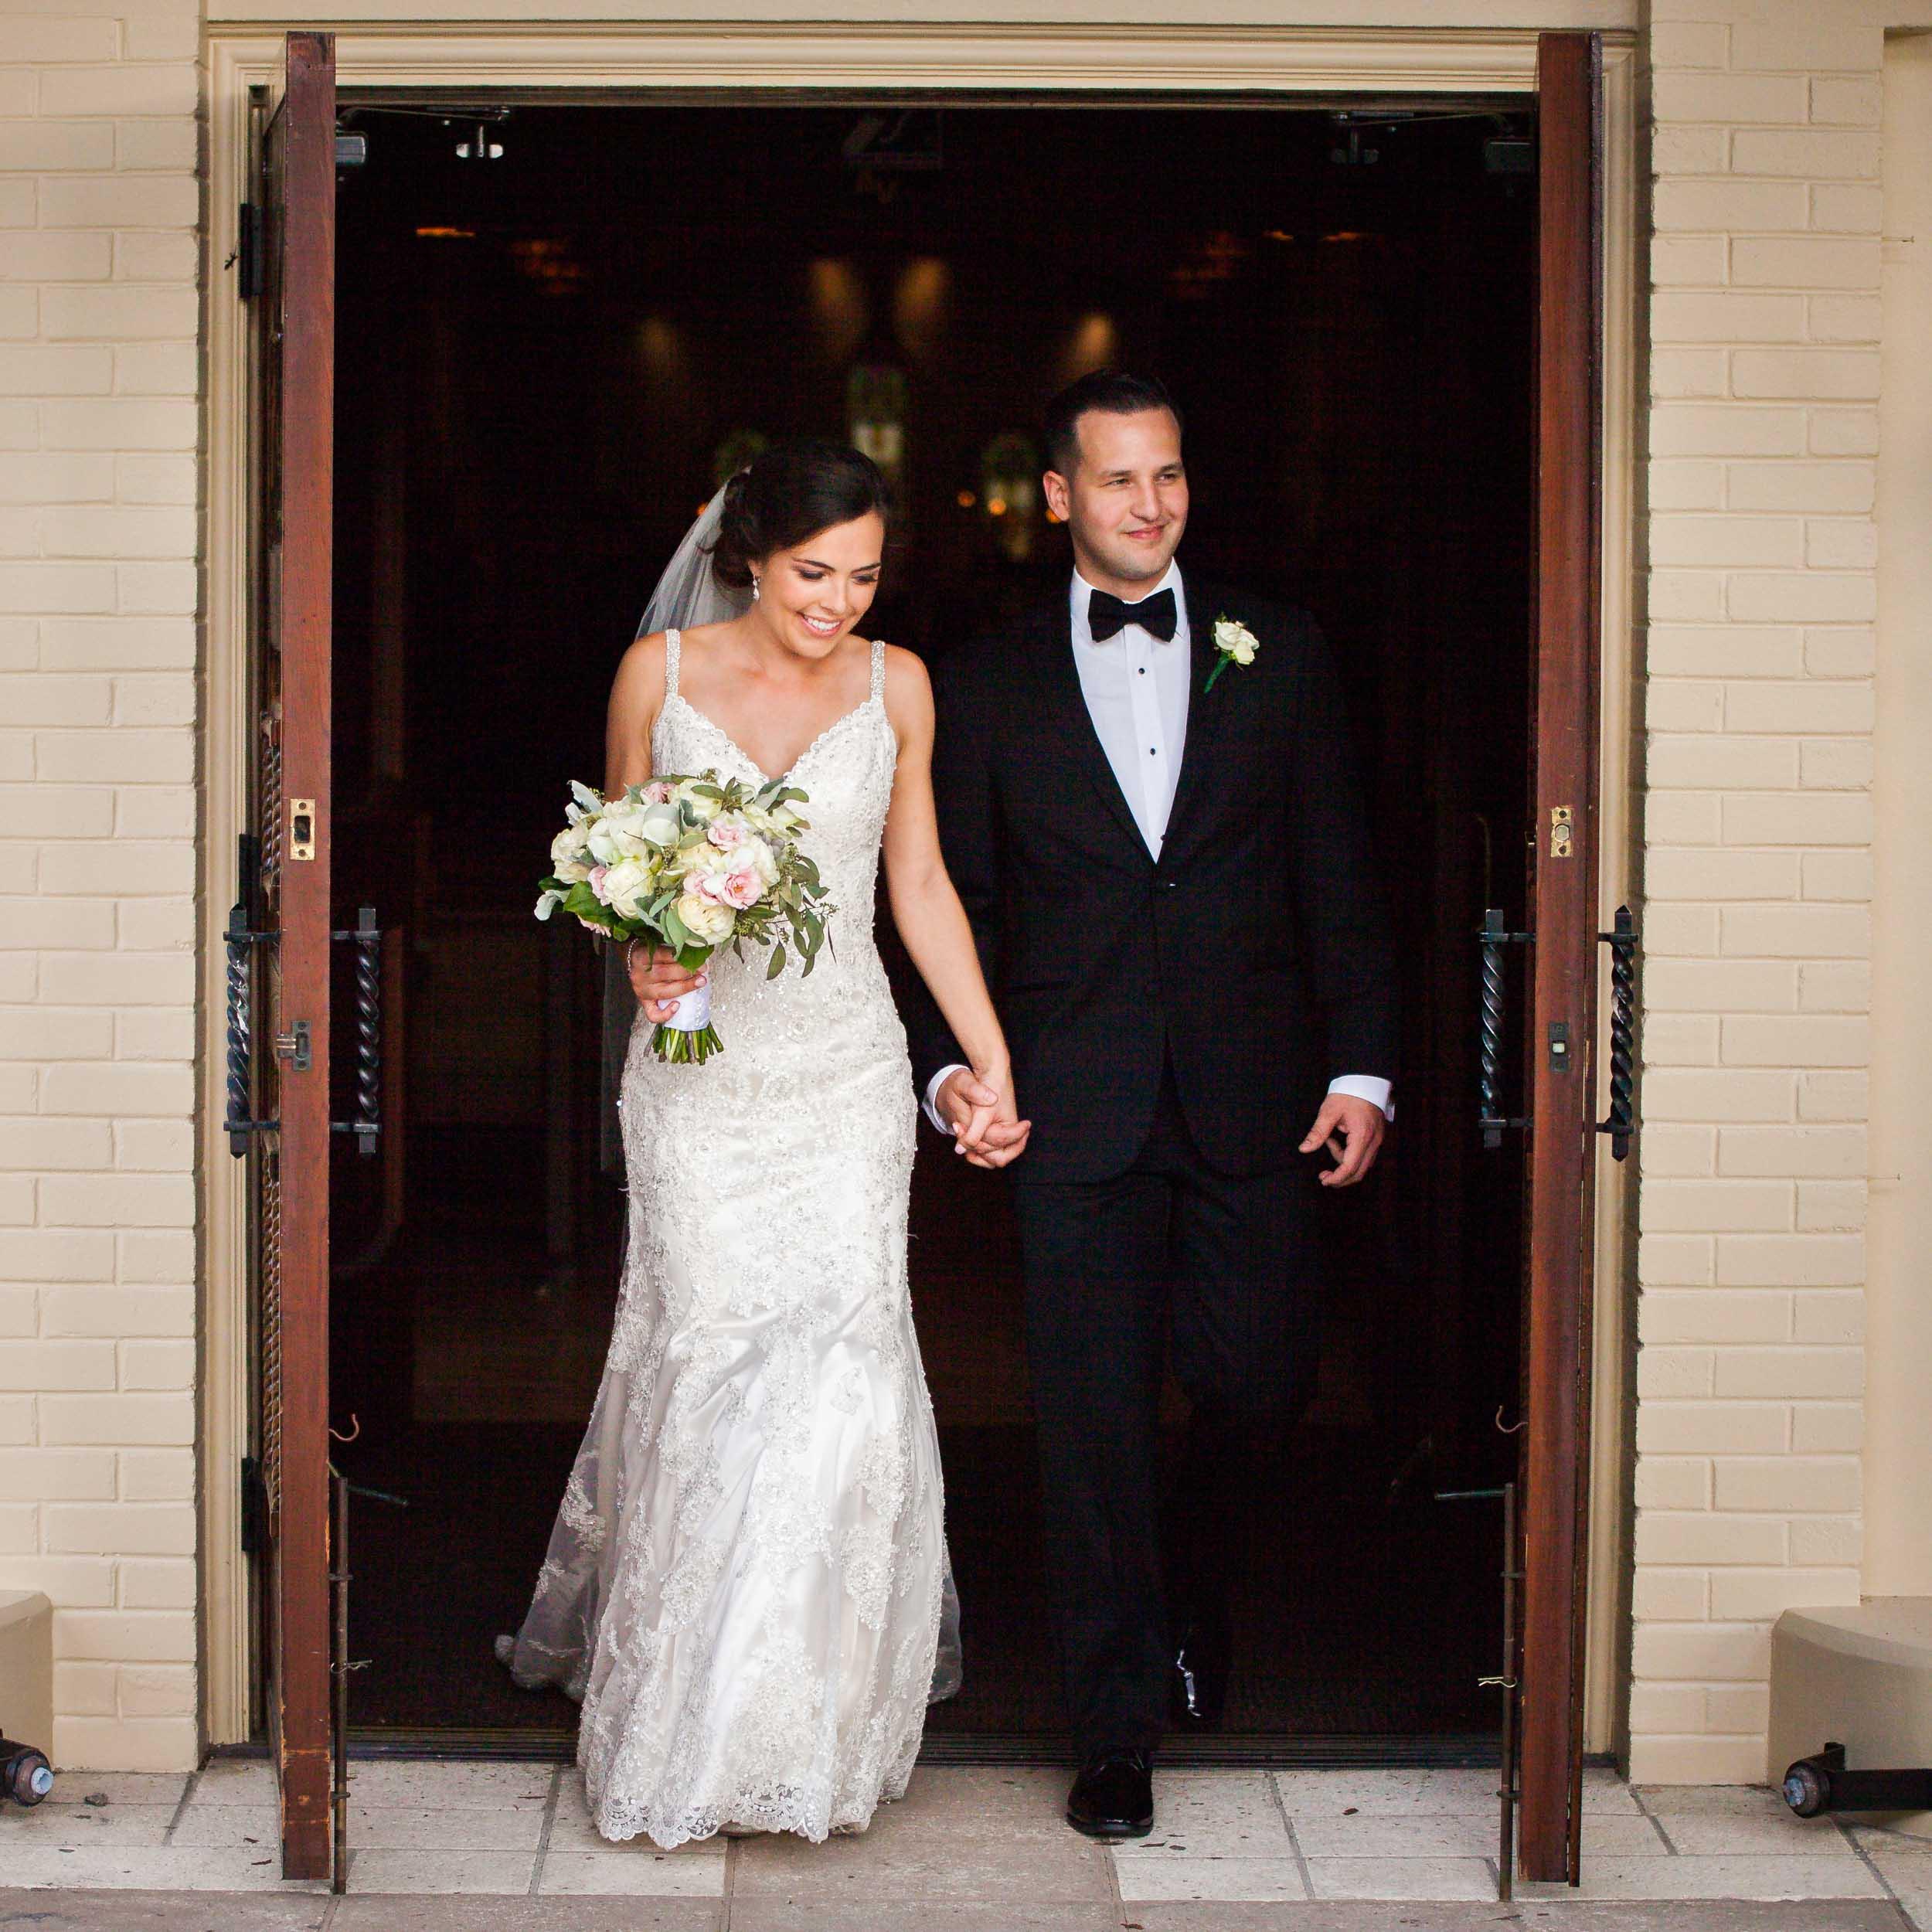 Flordia-Wedding-Photography-44.jpg